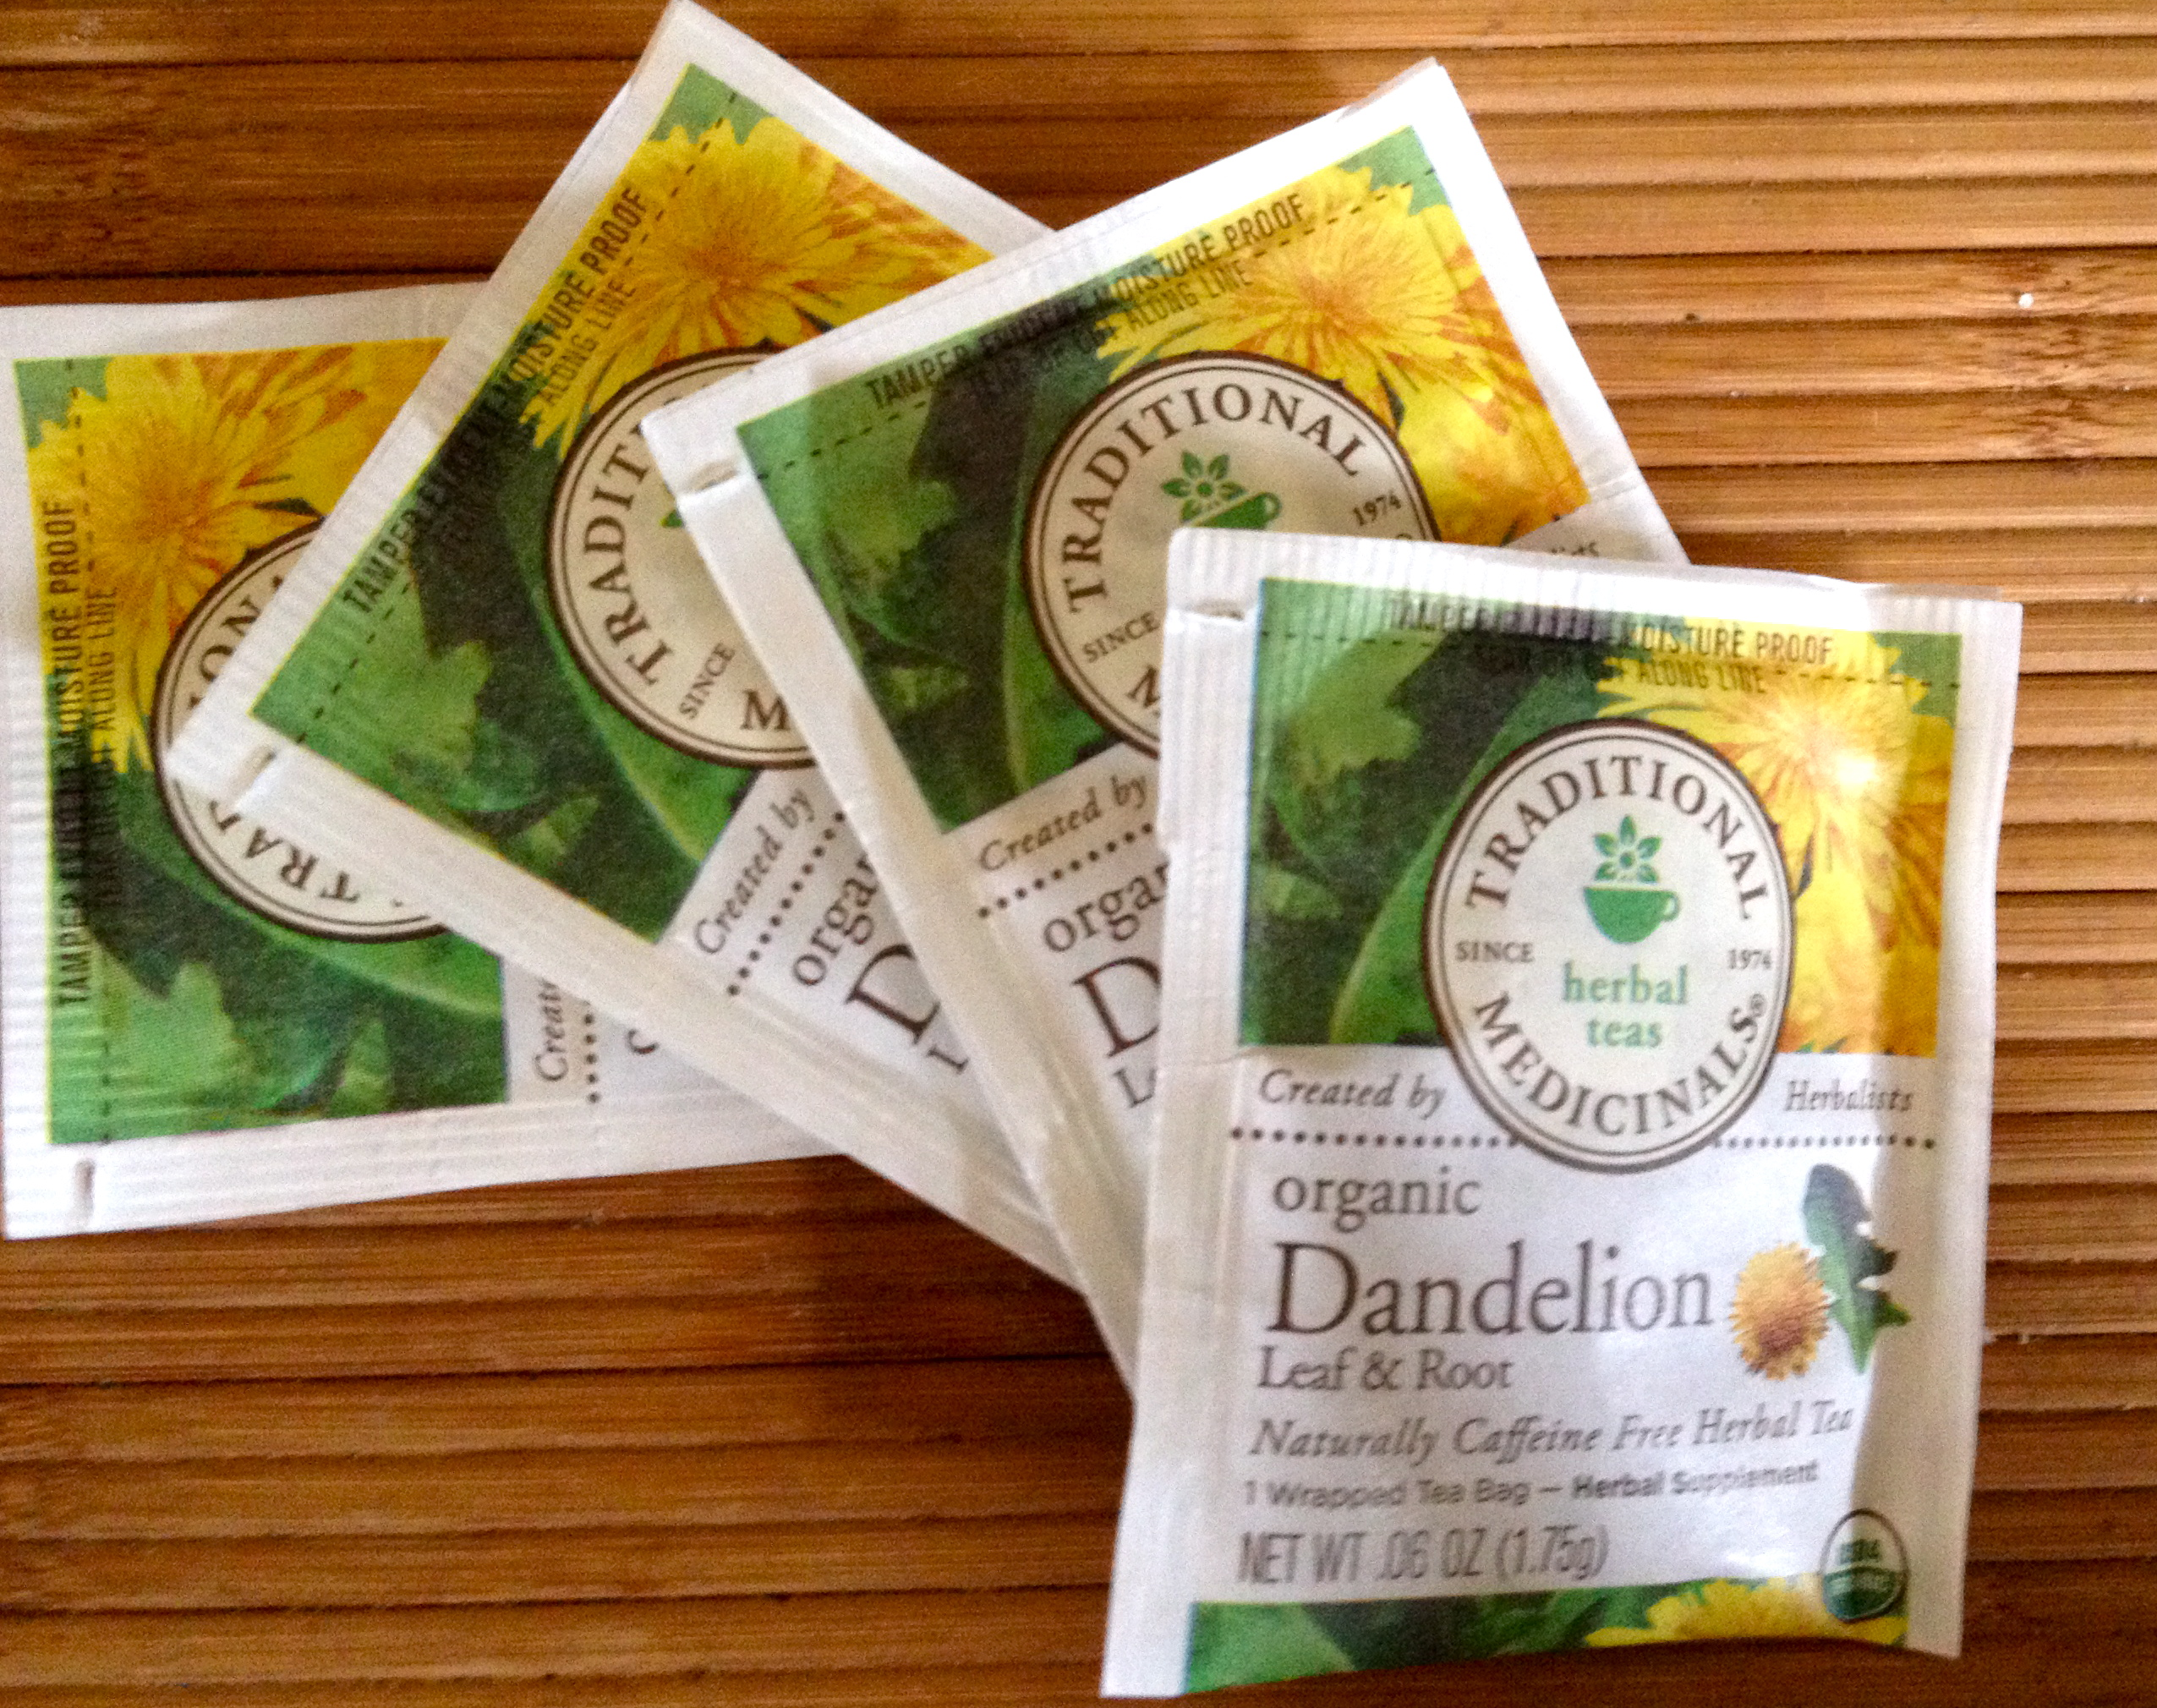 Traditional Medicinal Tea